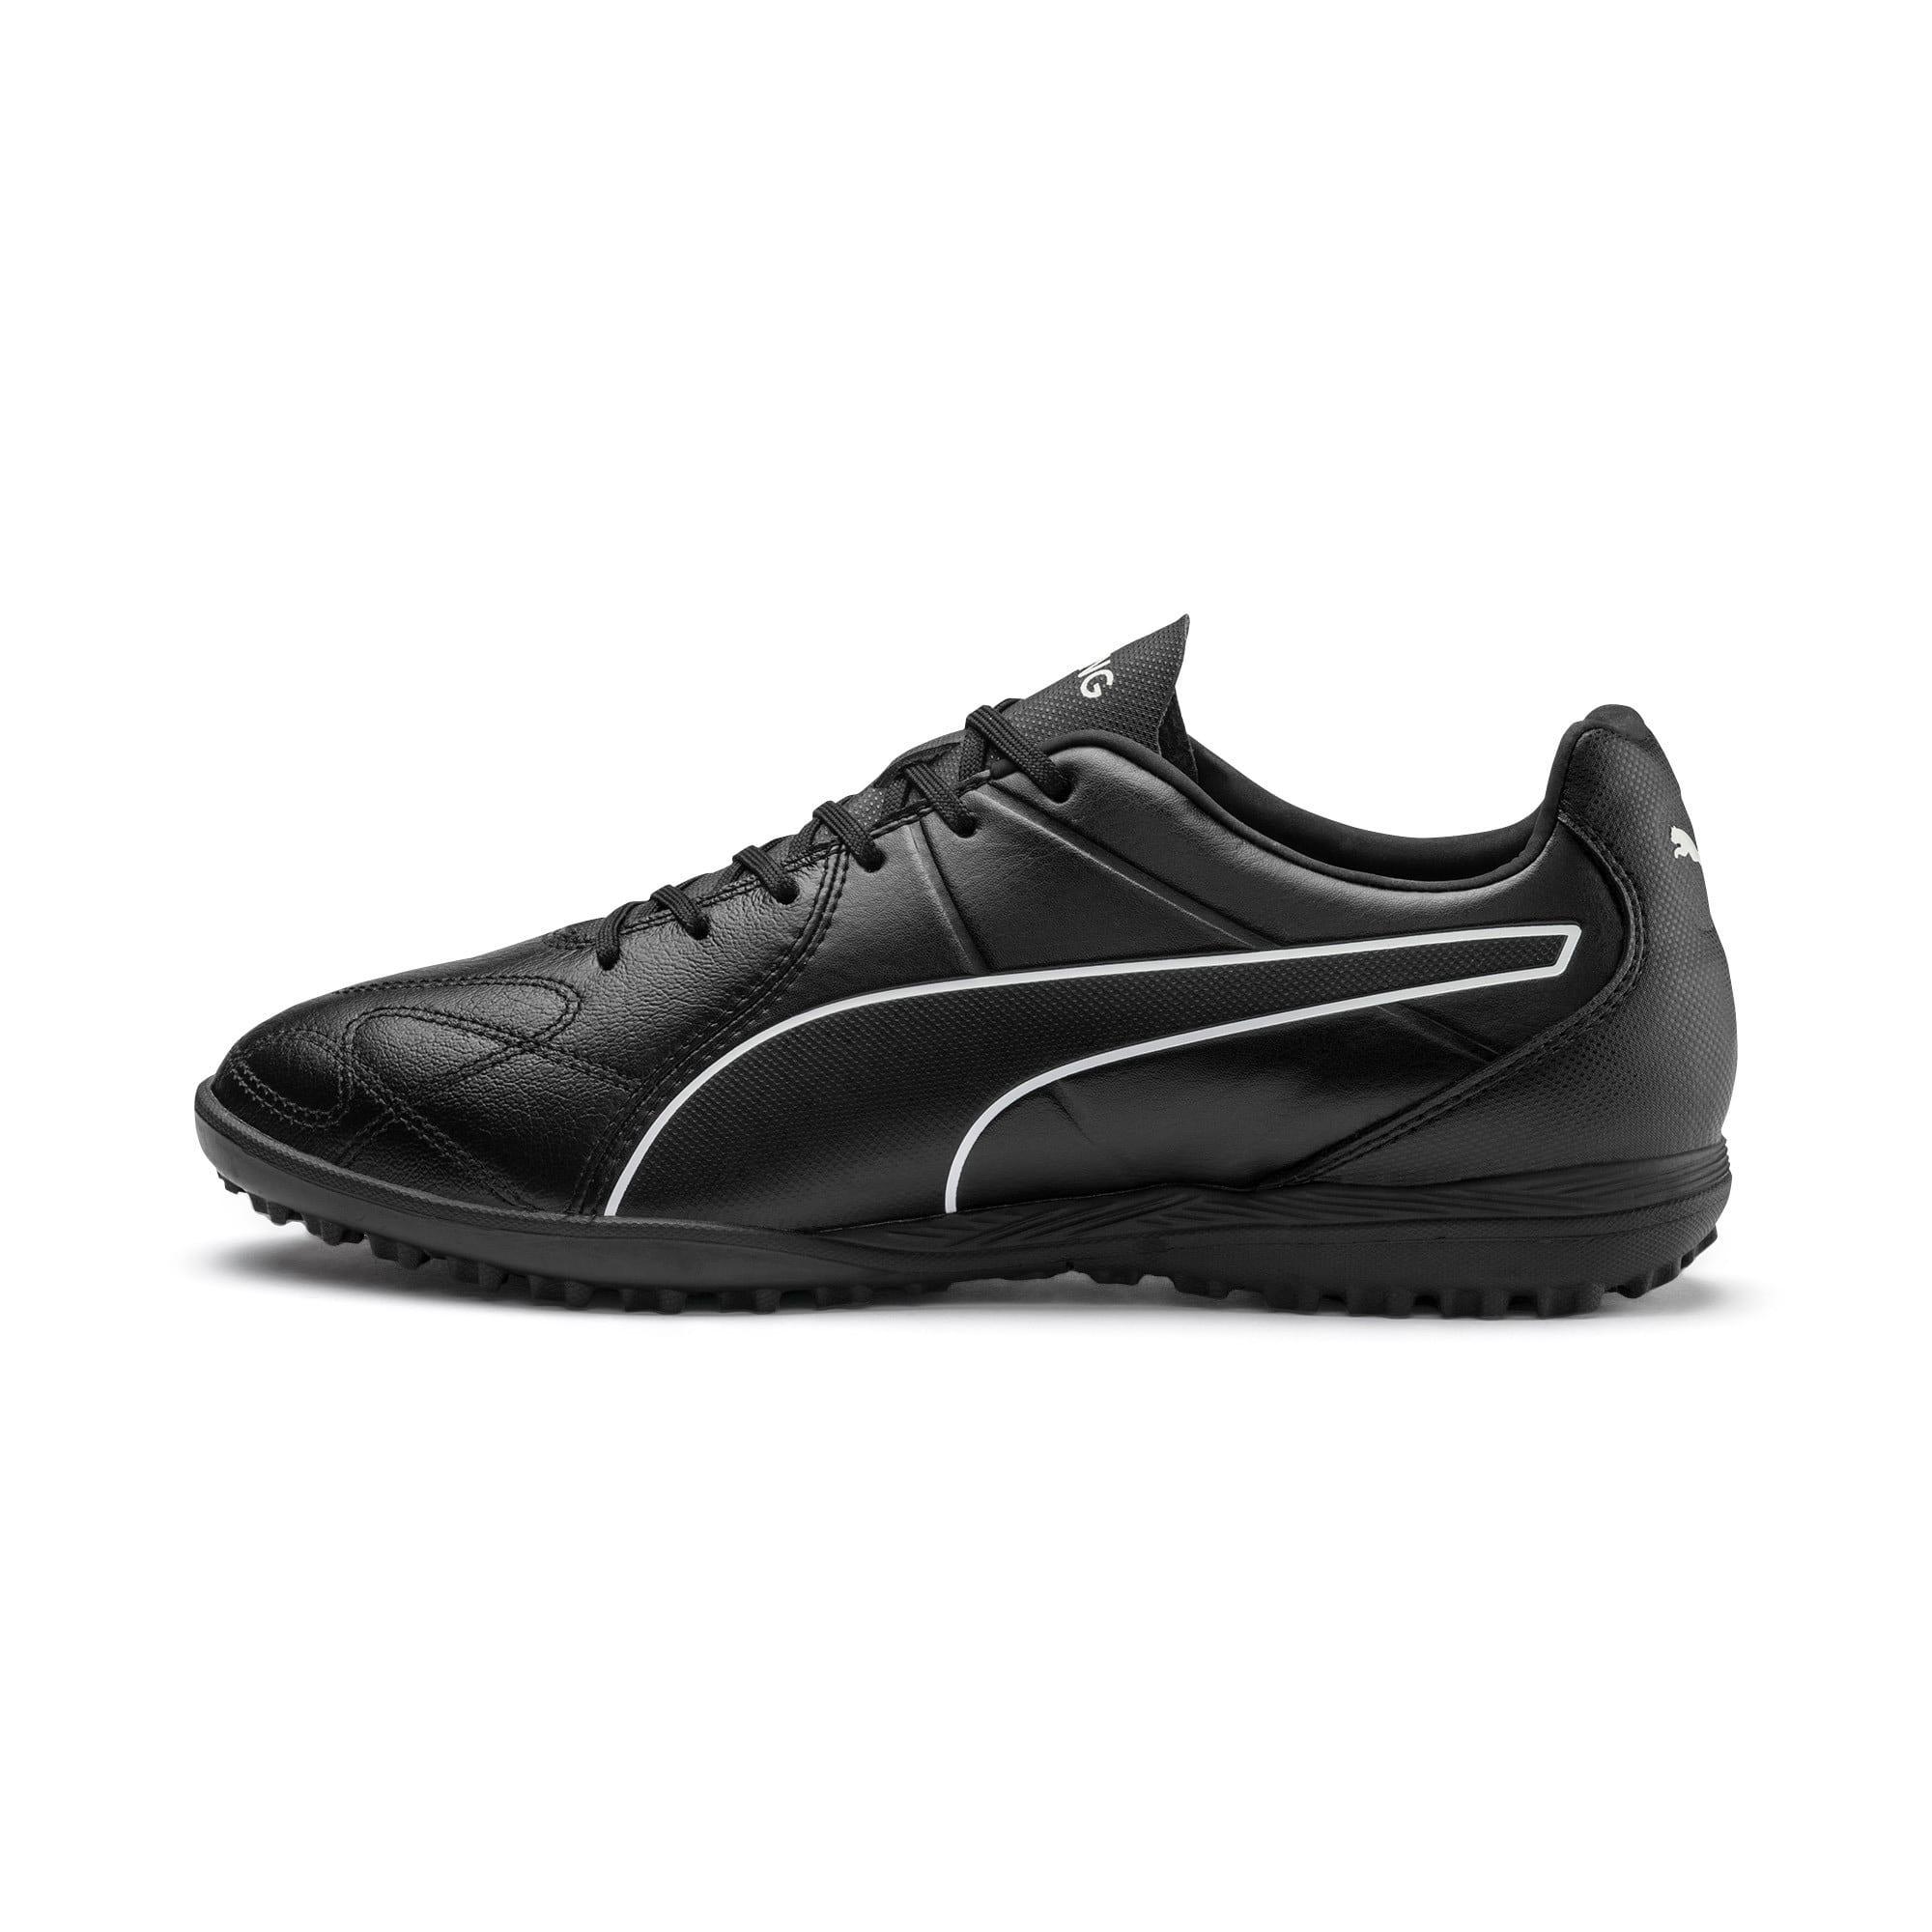 Thumbnail 1 of KING Hero TT Football Boots, Puma Black-Puma White, medium